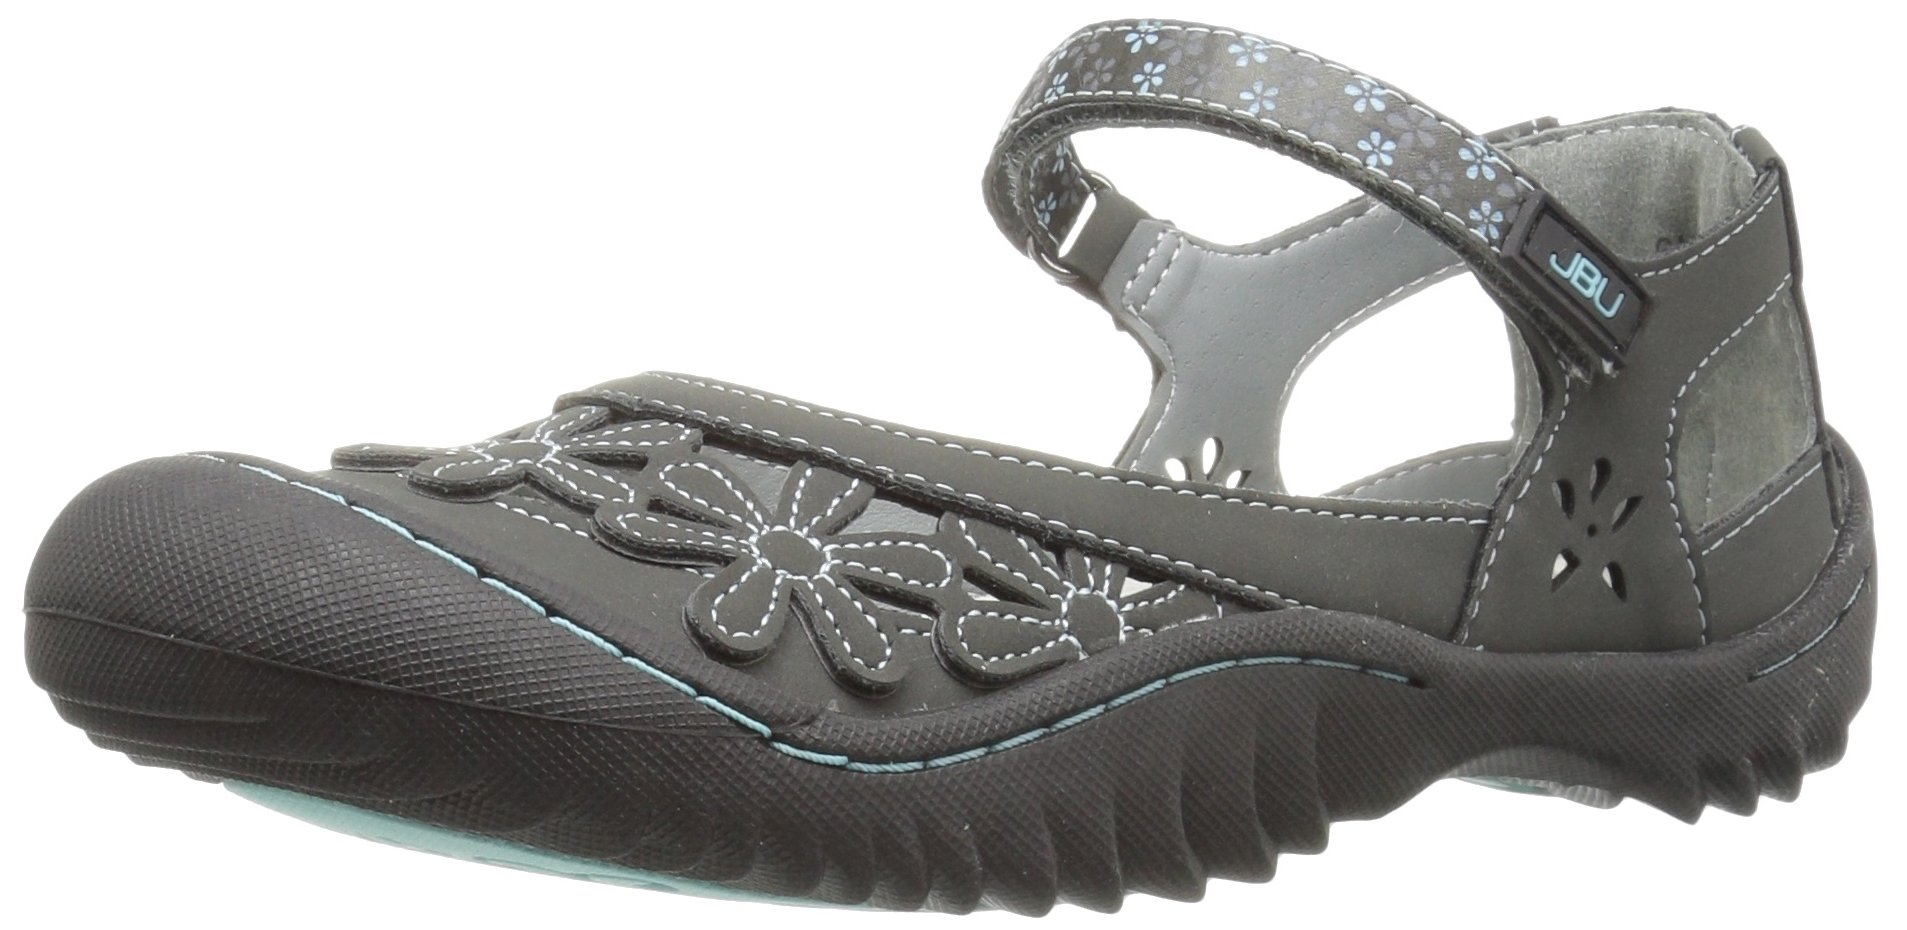 Jambu Jsport Women's Peony Charcoal Synthetic Casual Shoe - 8.5 B(M) US